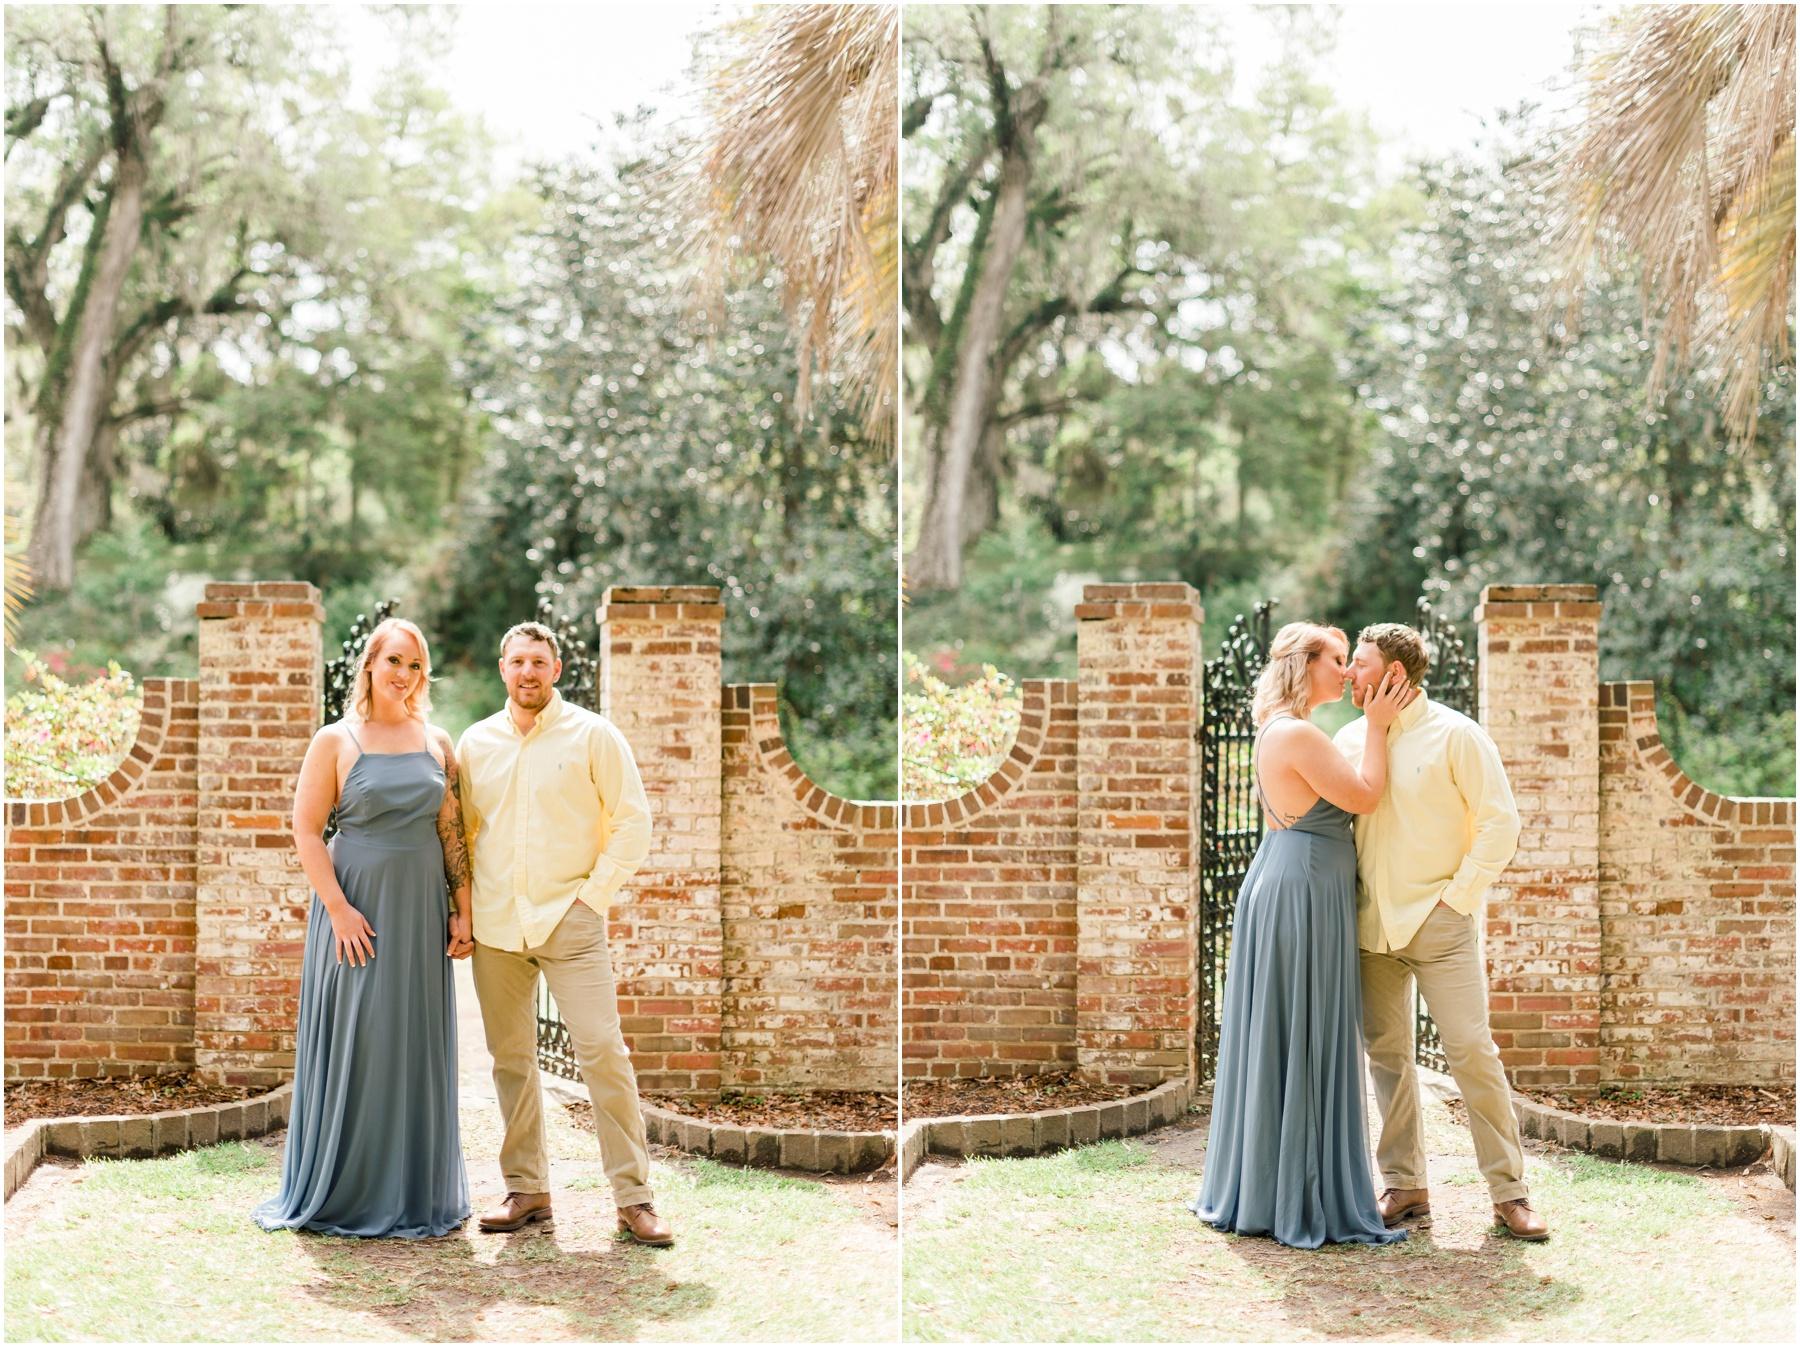 Mepkin-Abbey-Moncks-Corner-South-Carolina-Engagement-Session-Photos_0009.jpg